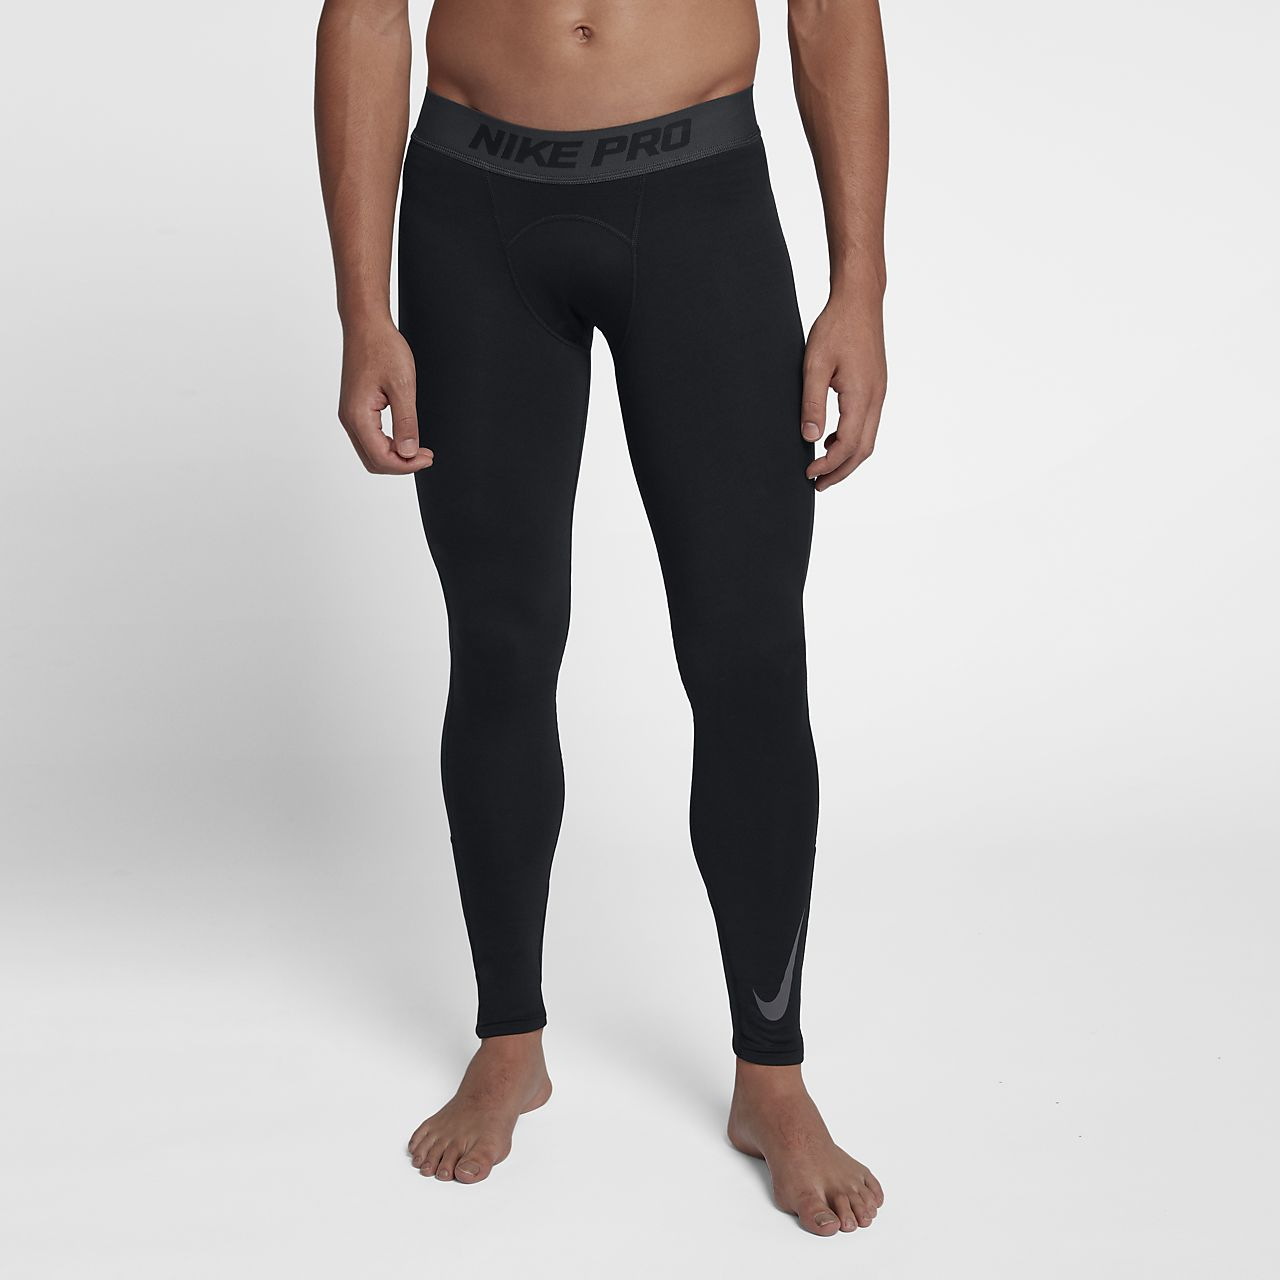 8cb8dfae Nike Pro Dri-FIT Therma Men's Tights. Nike.com GB